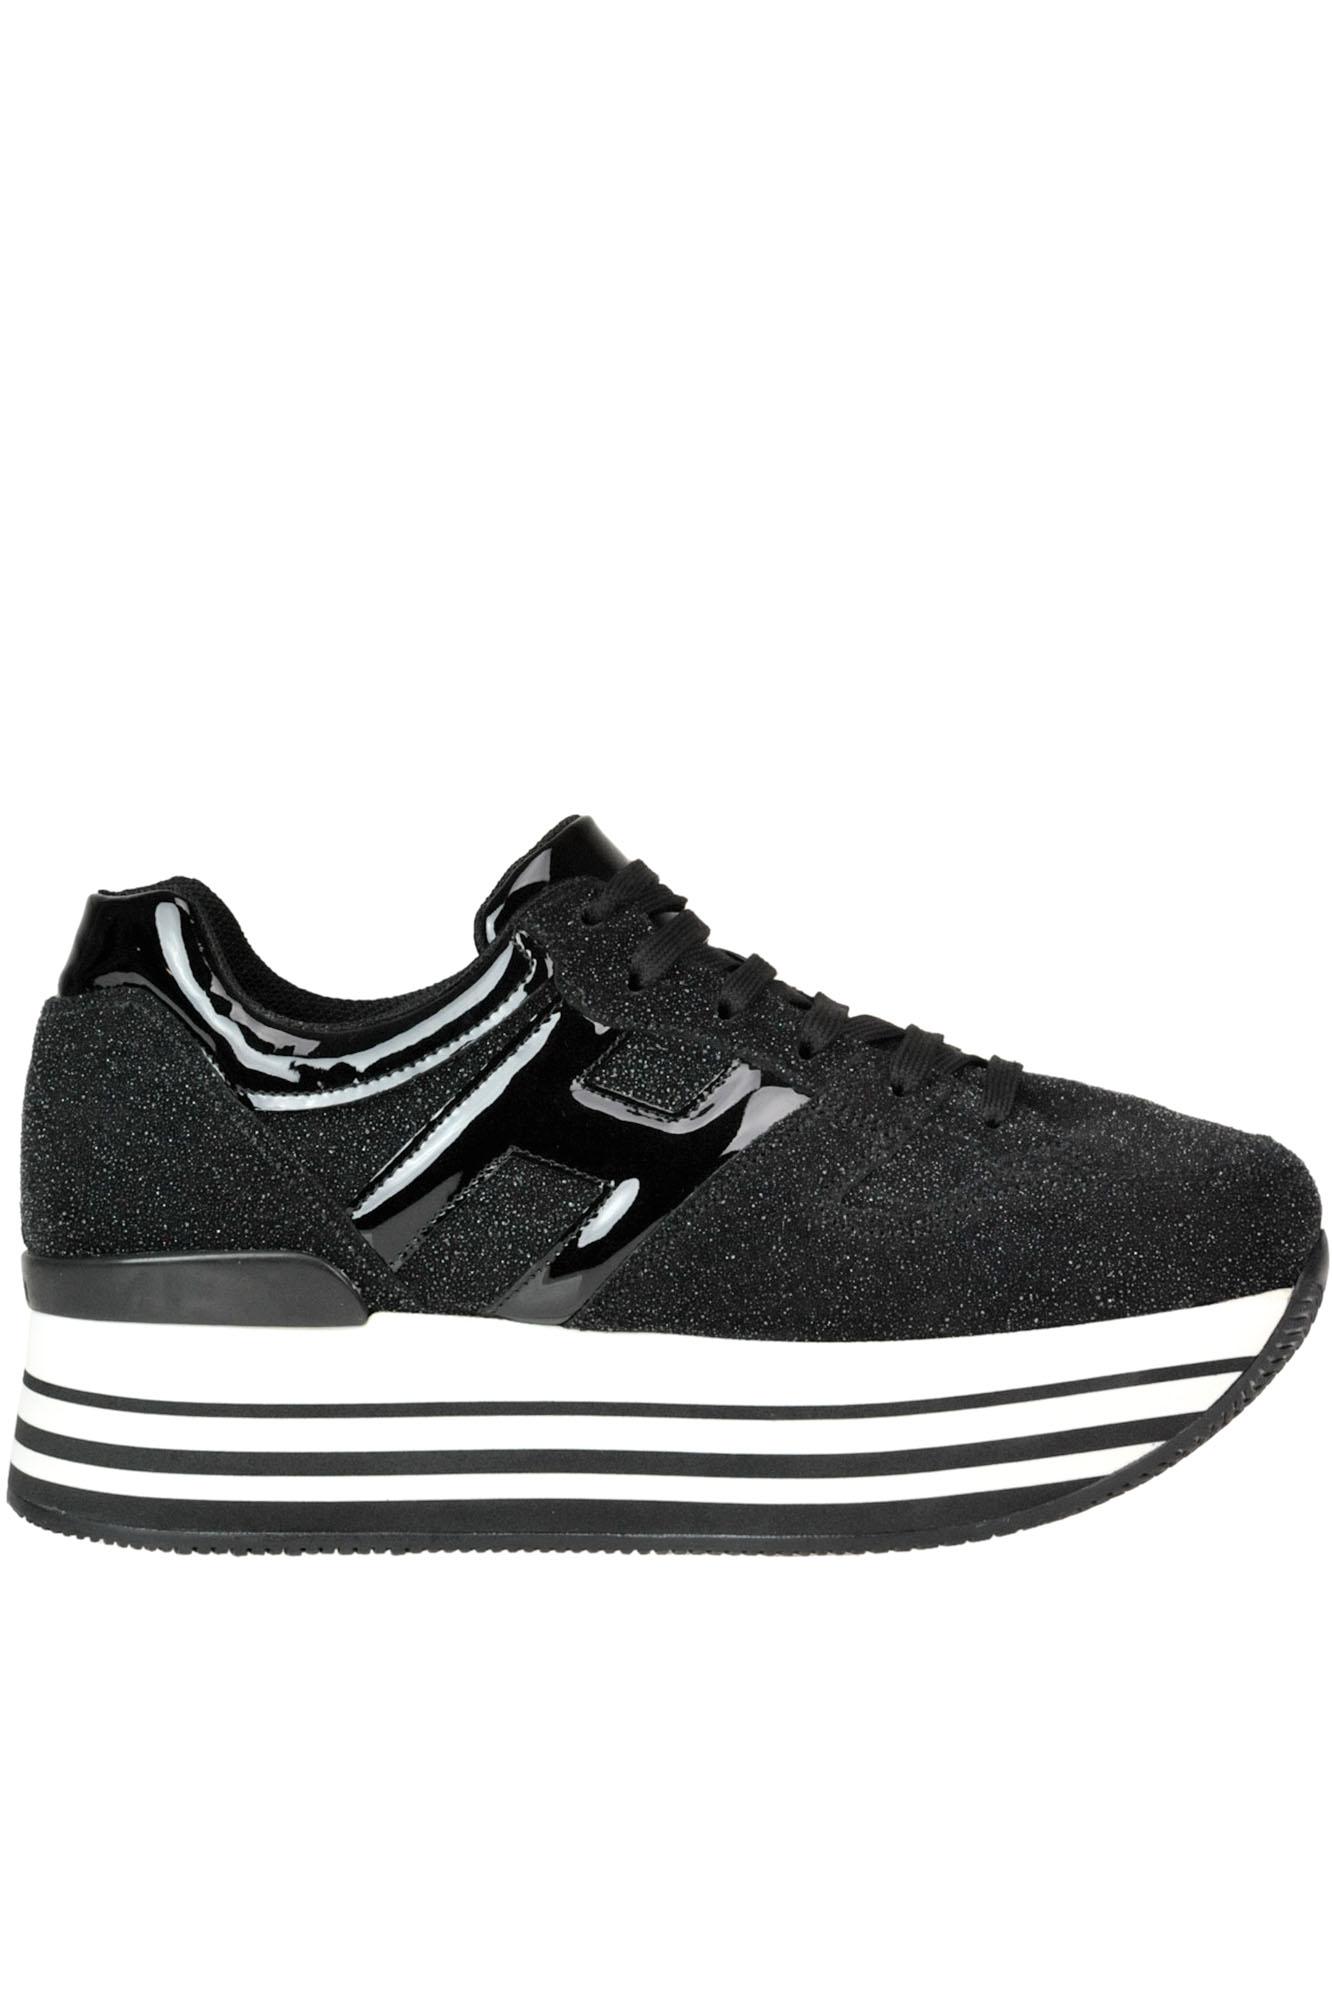 d872967671 Hogan 'Maxi 222' Wedge Sneakers In Black | ModeSens